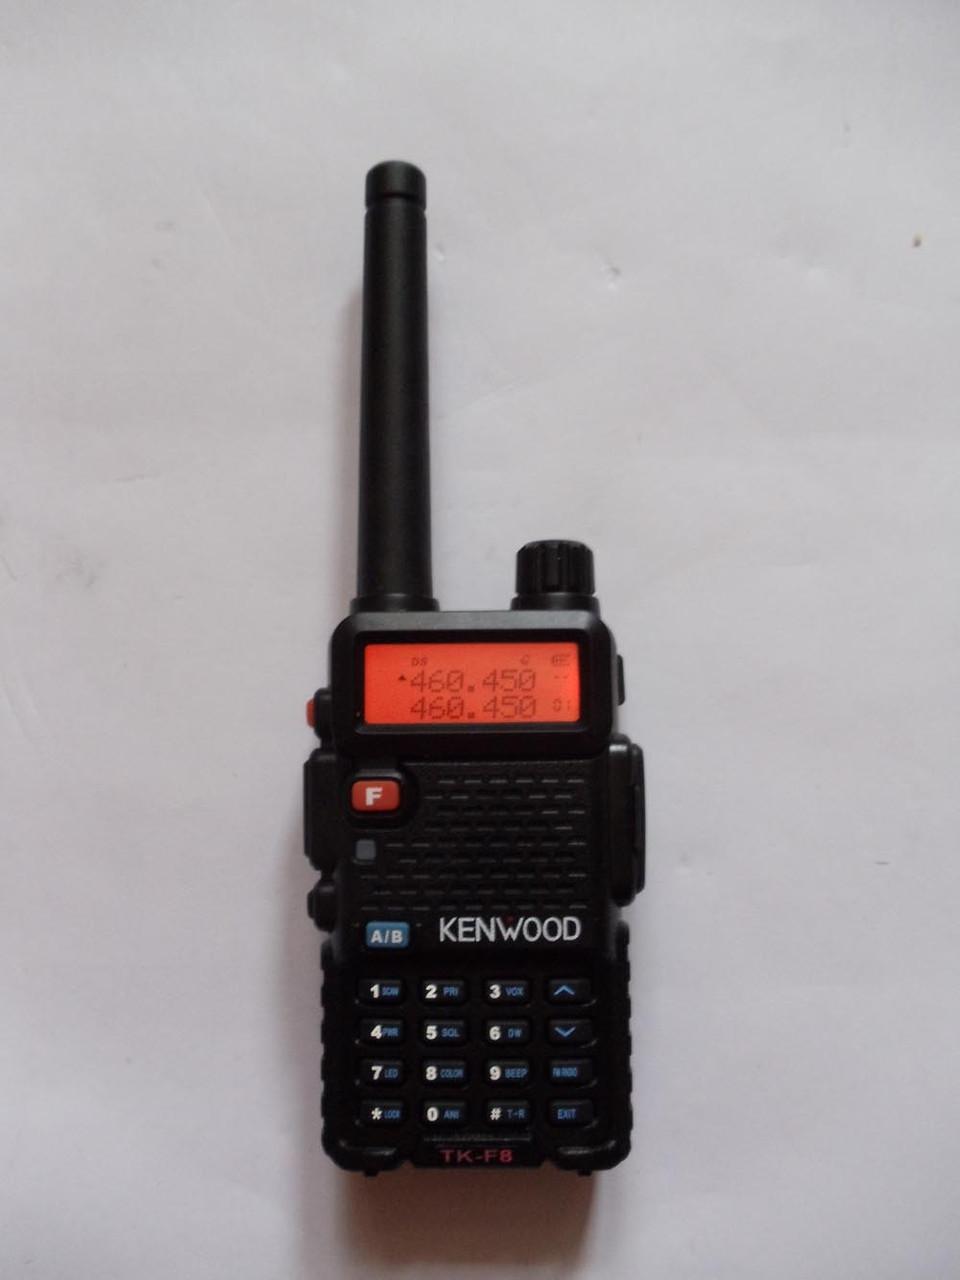 Kenwood TK-F8 (7W) 440-480МГц